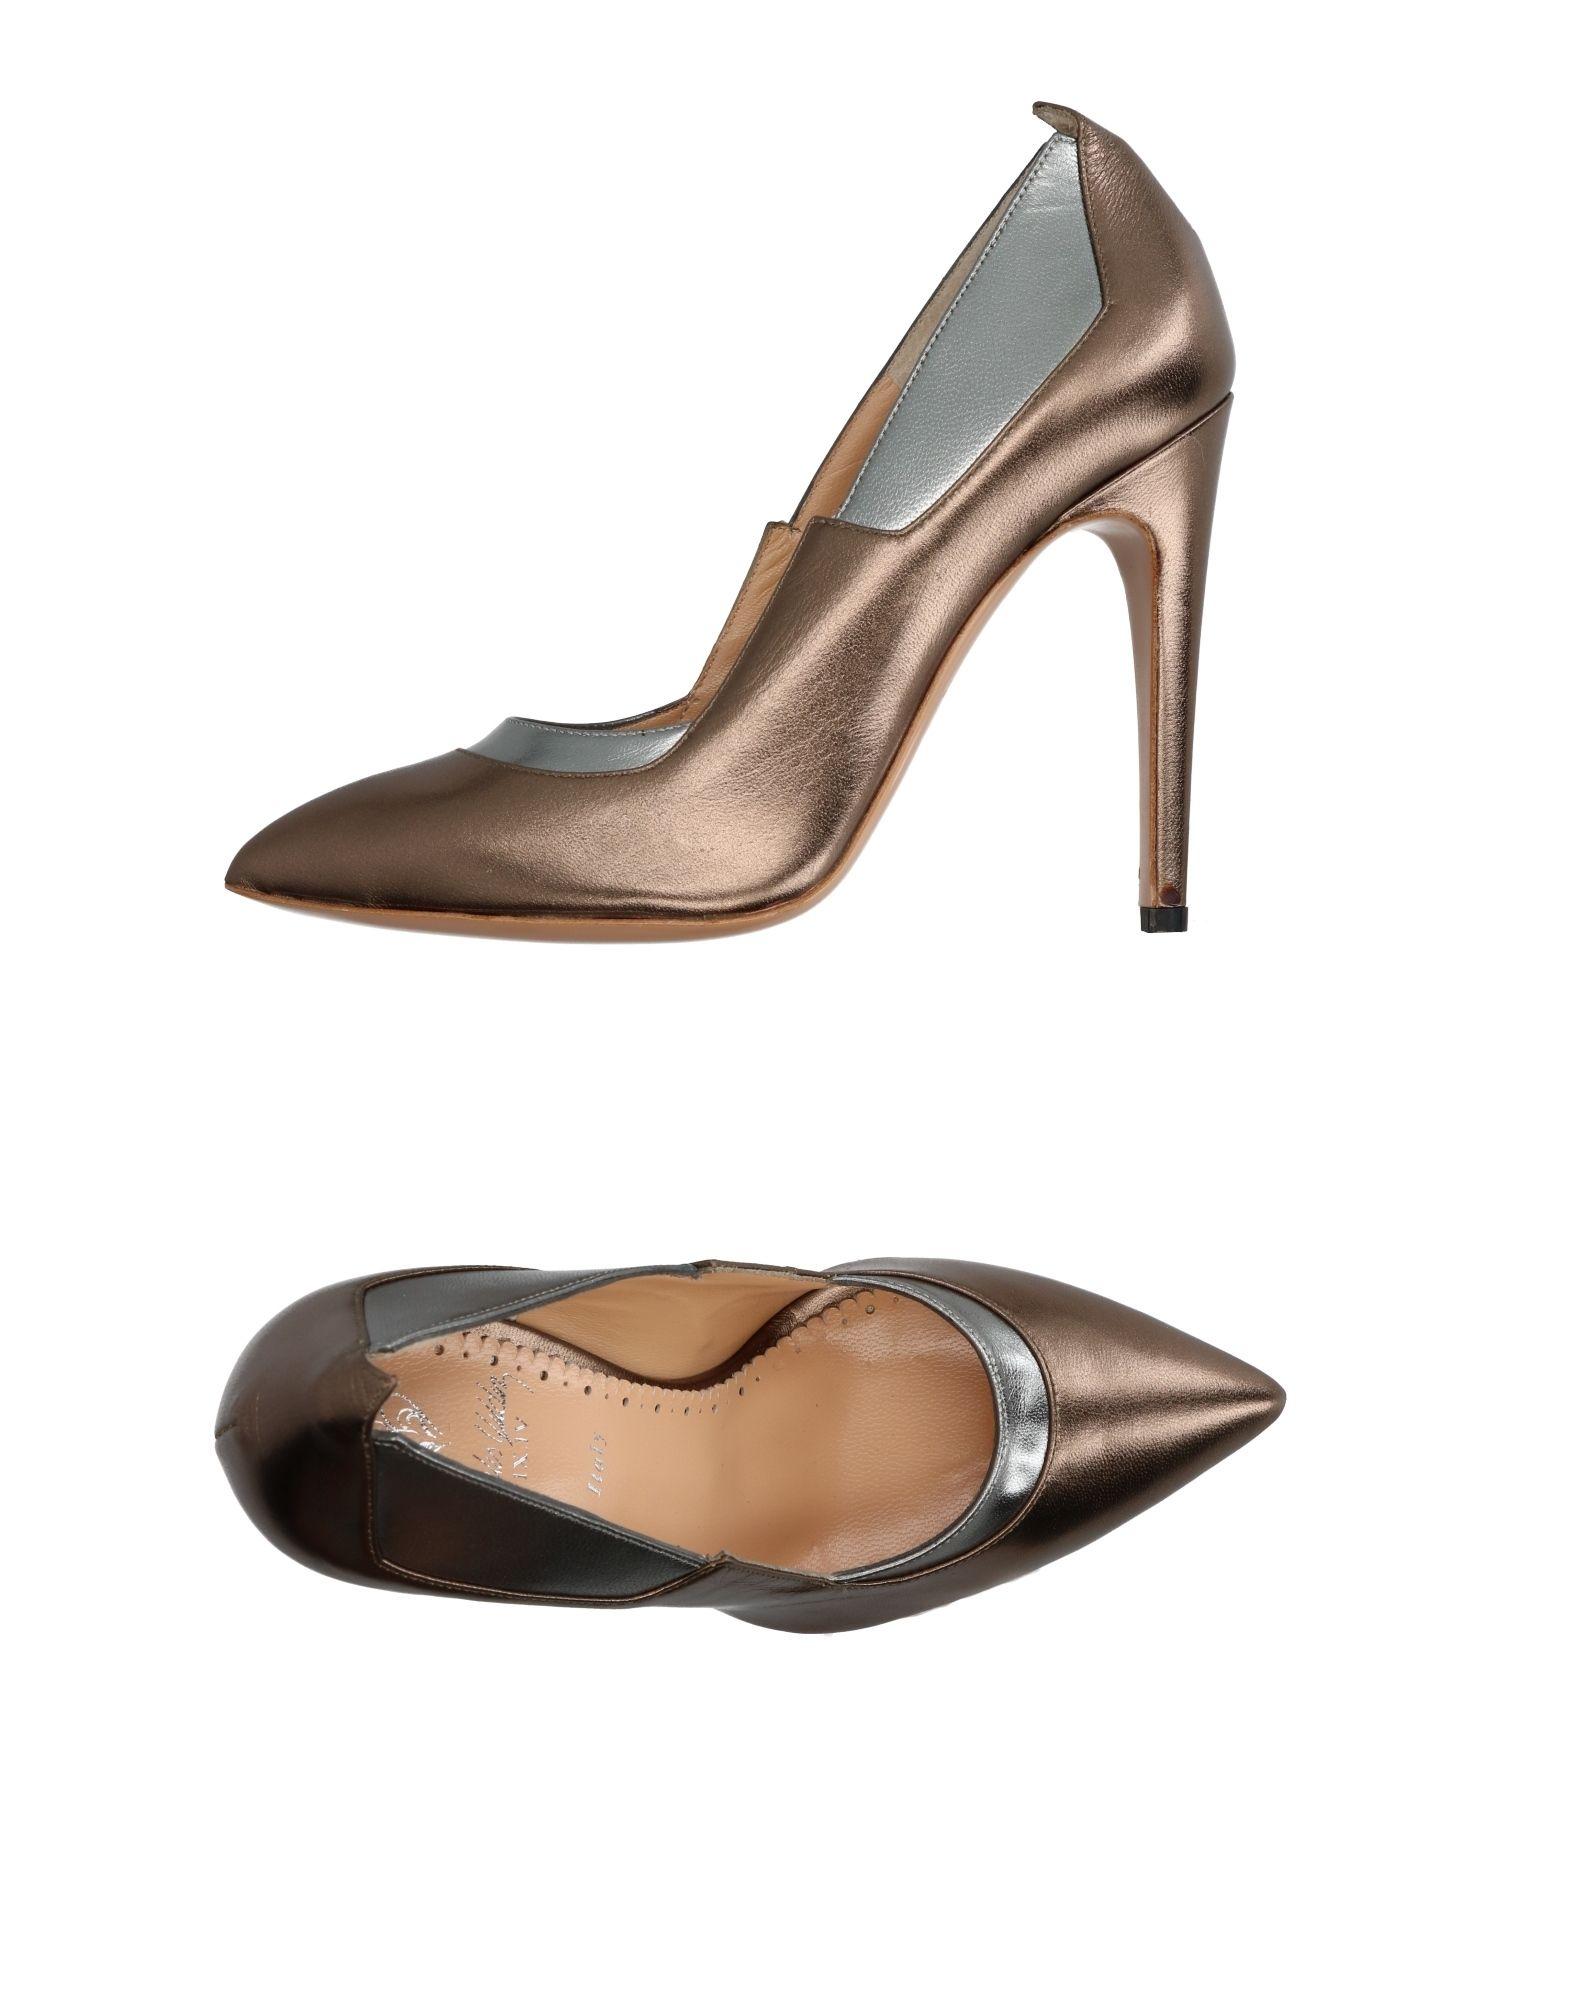 Melis Yildiz Ix.Iv Pumps Damen  11305464GC Gute Qualität beliebte Schuhe